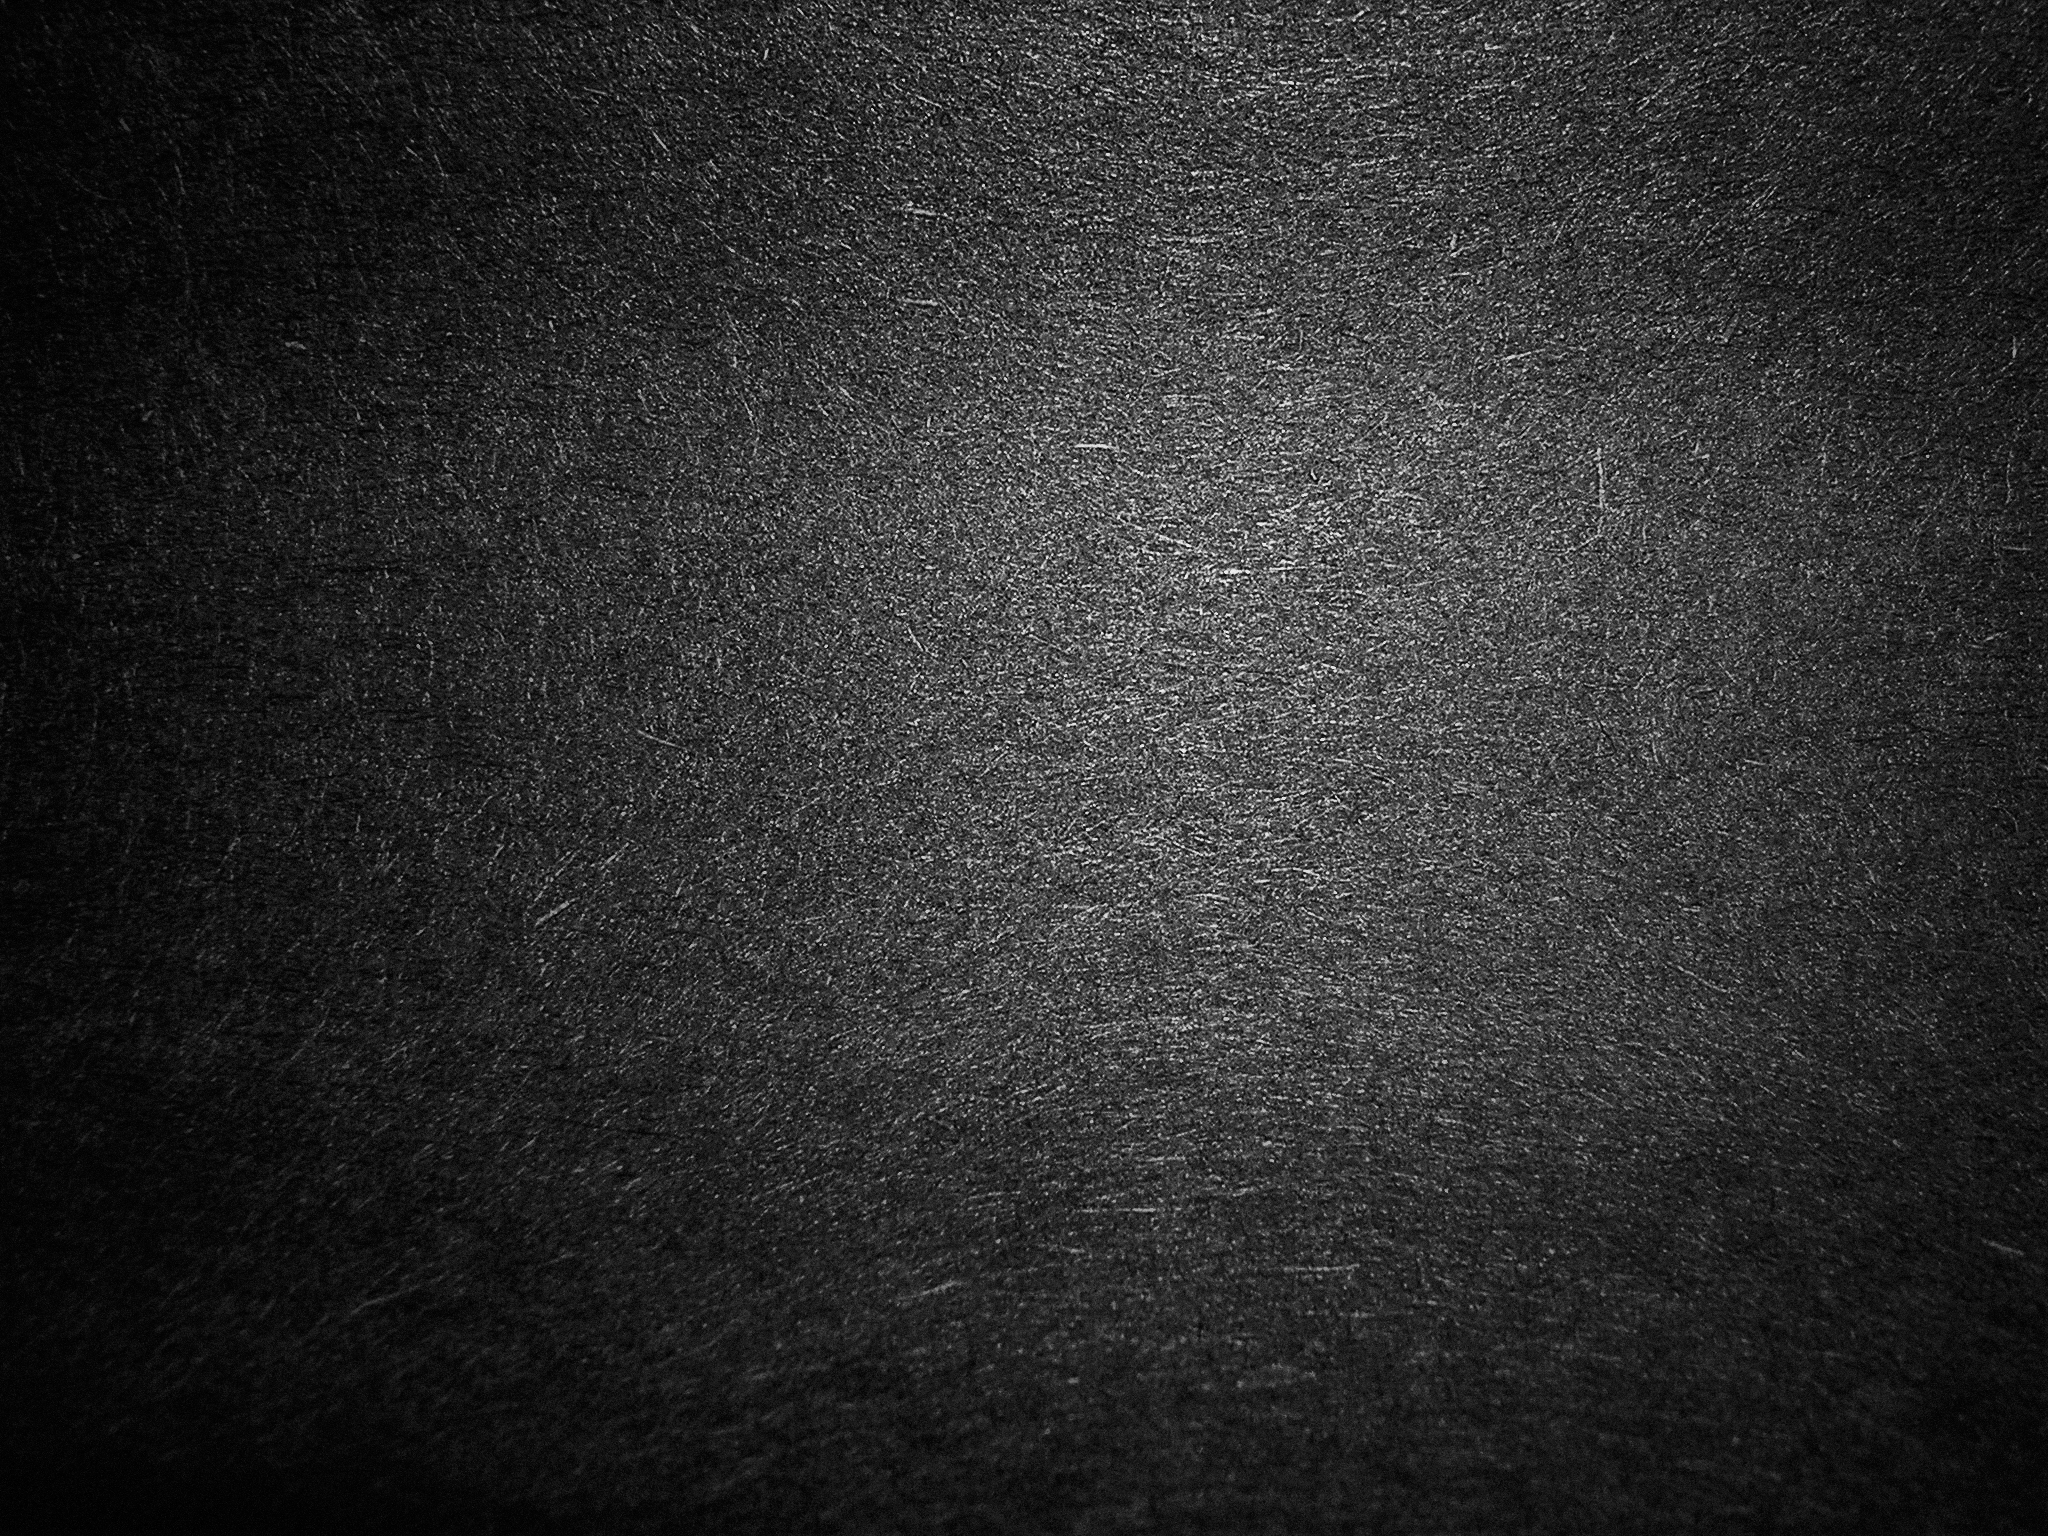 Gray texture | Flickr - Photo Sharing!